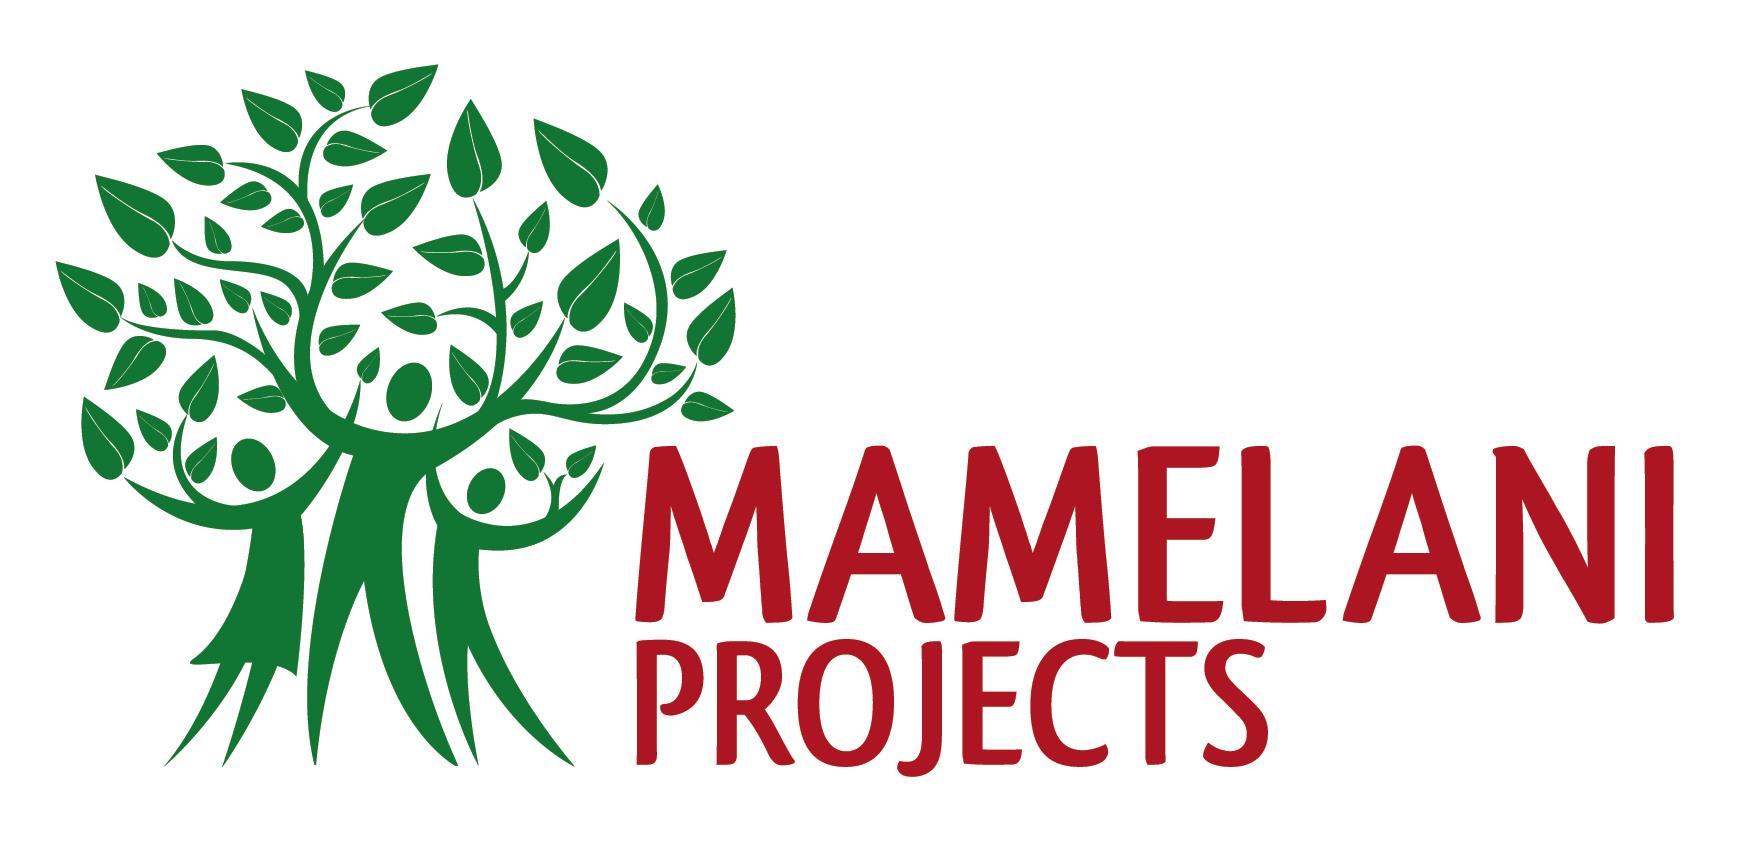 Mamelani